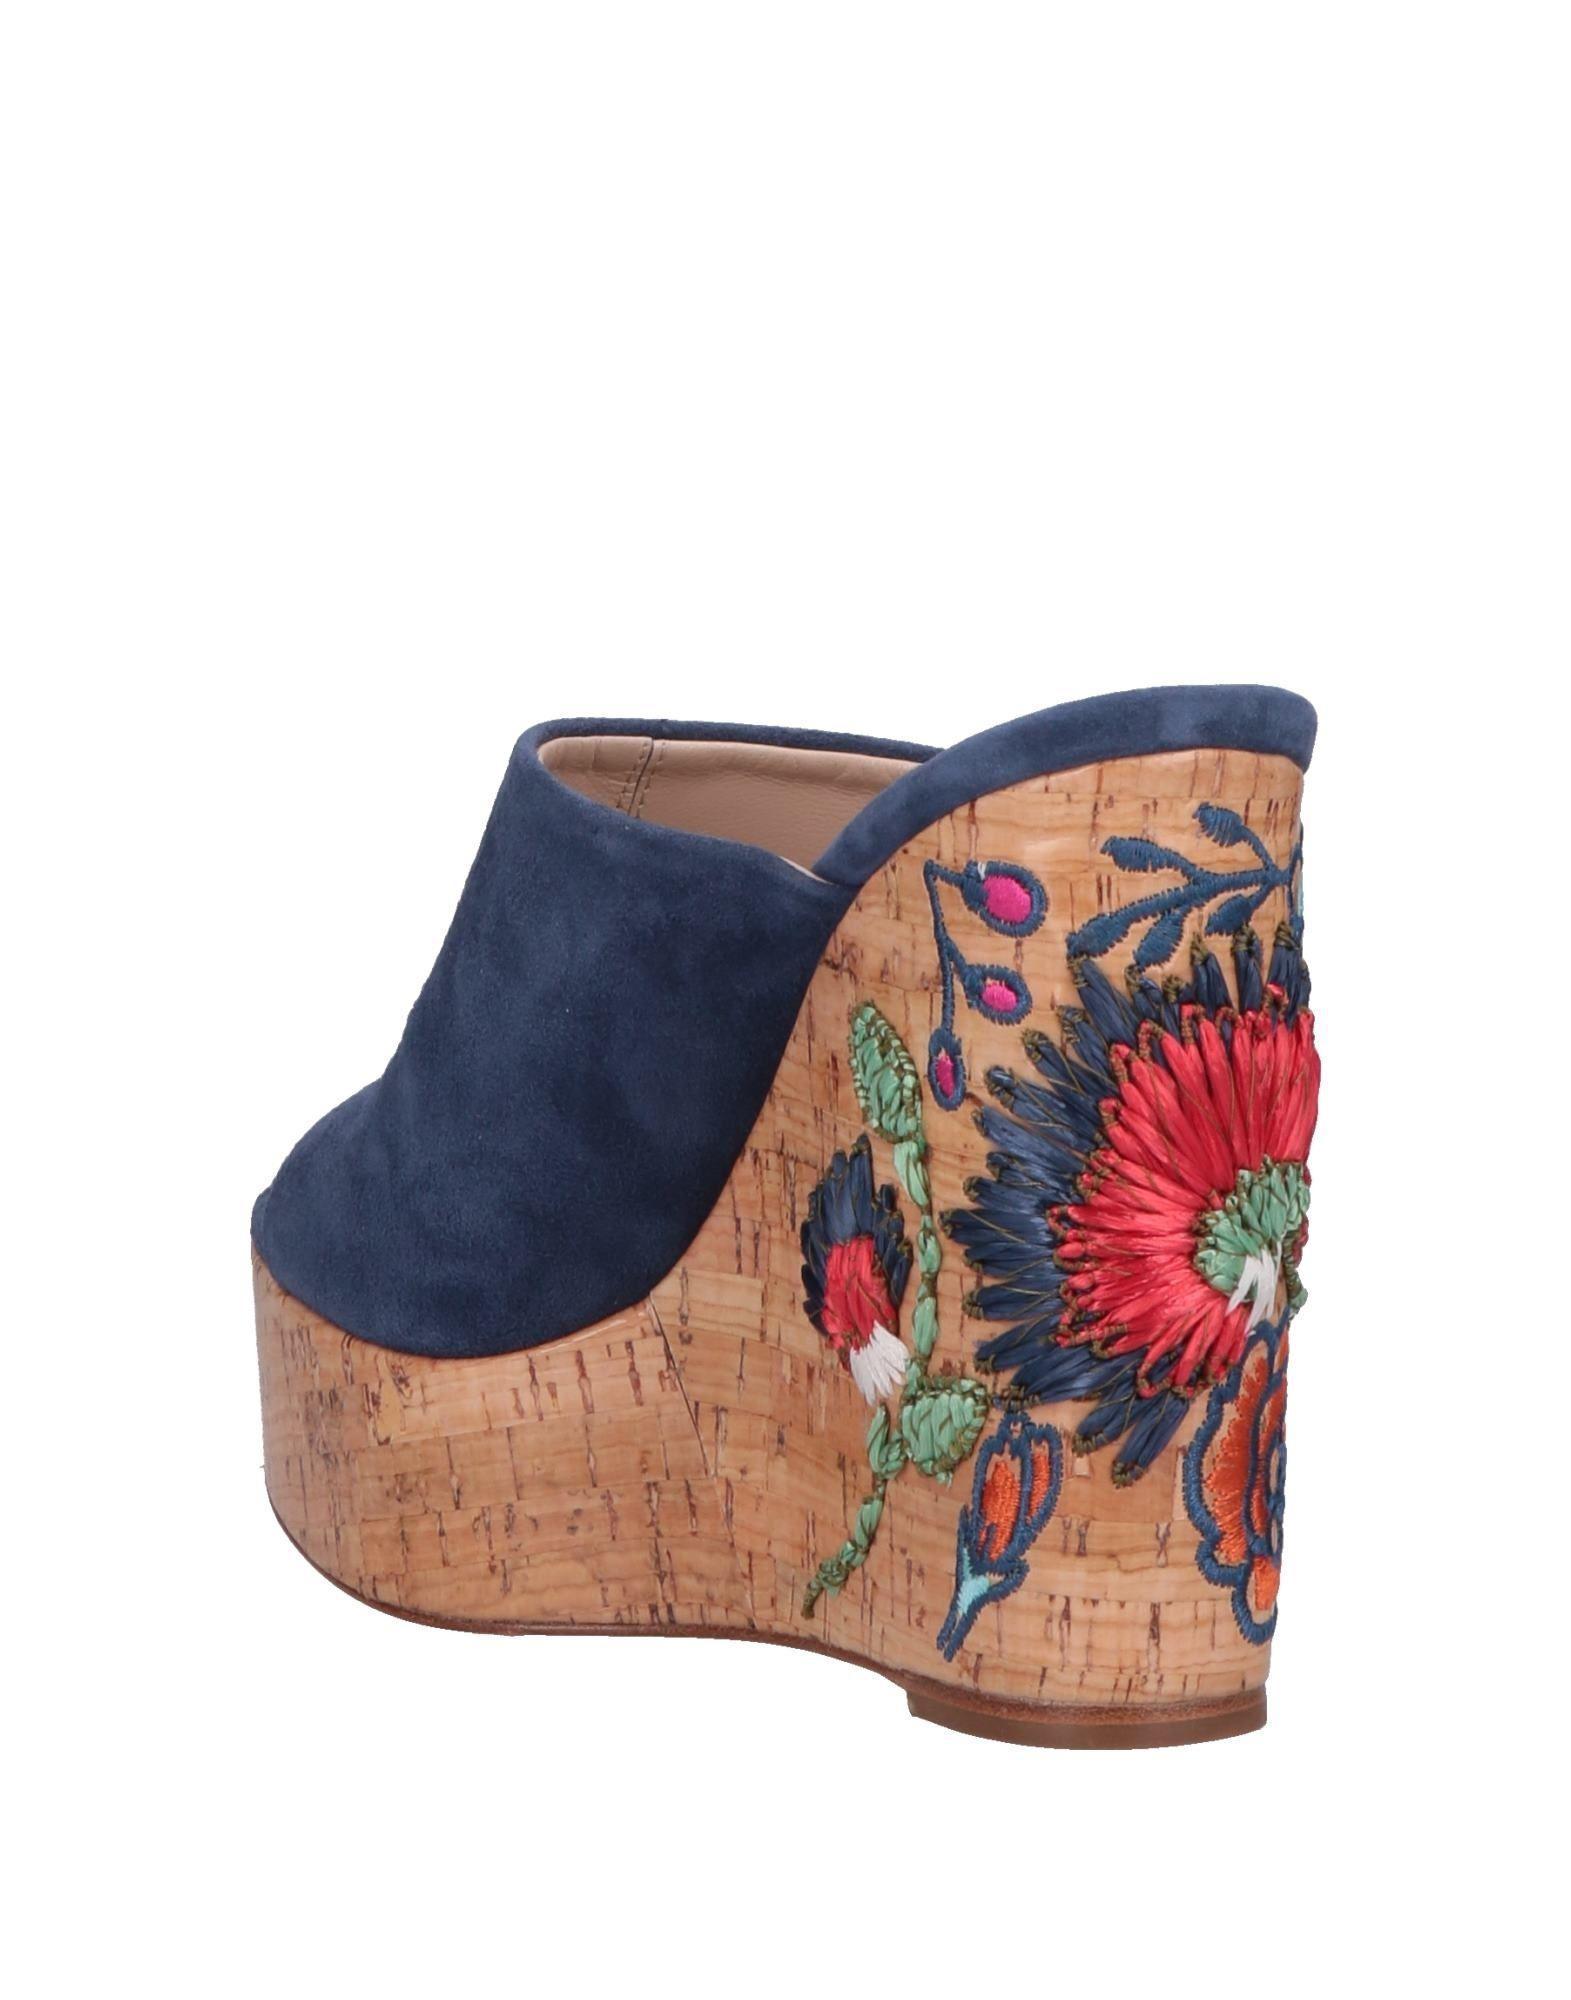 a21858650ec Lyst - Paloma Barceló Sandals in Blue